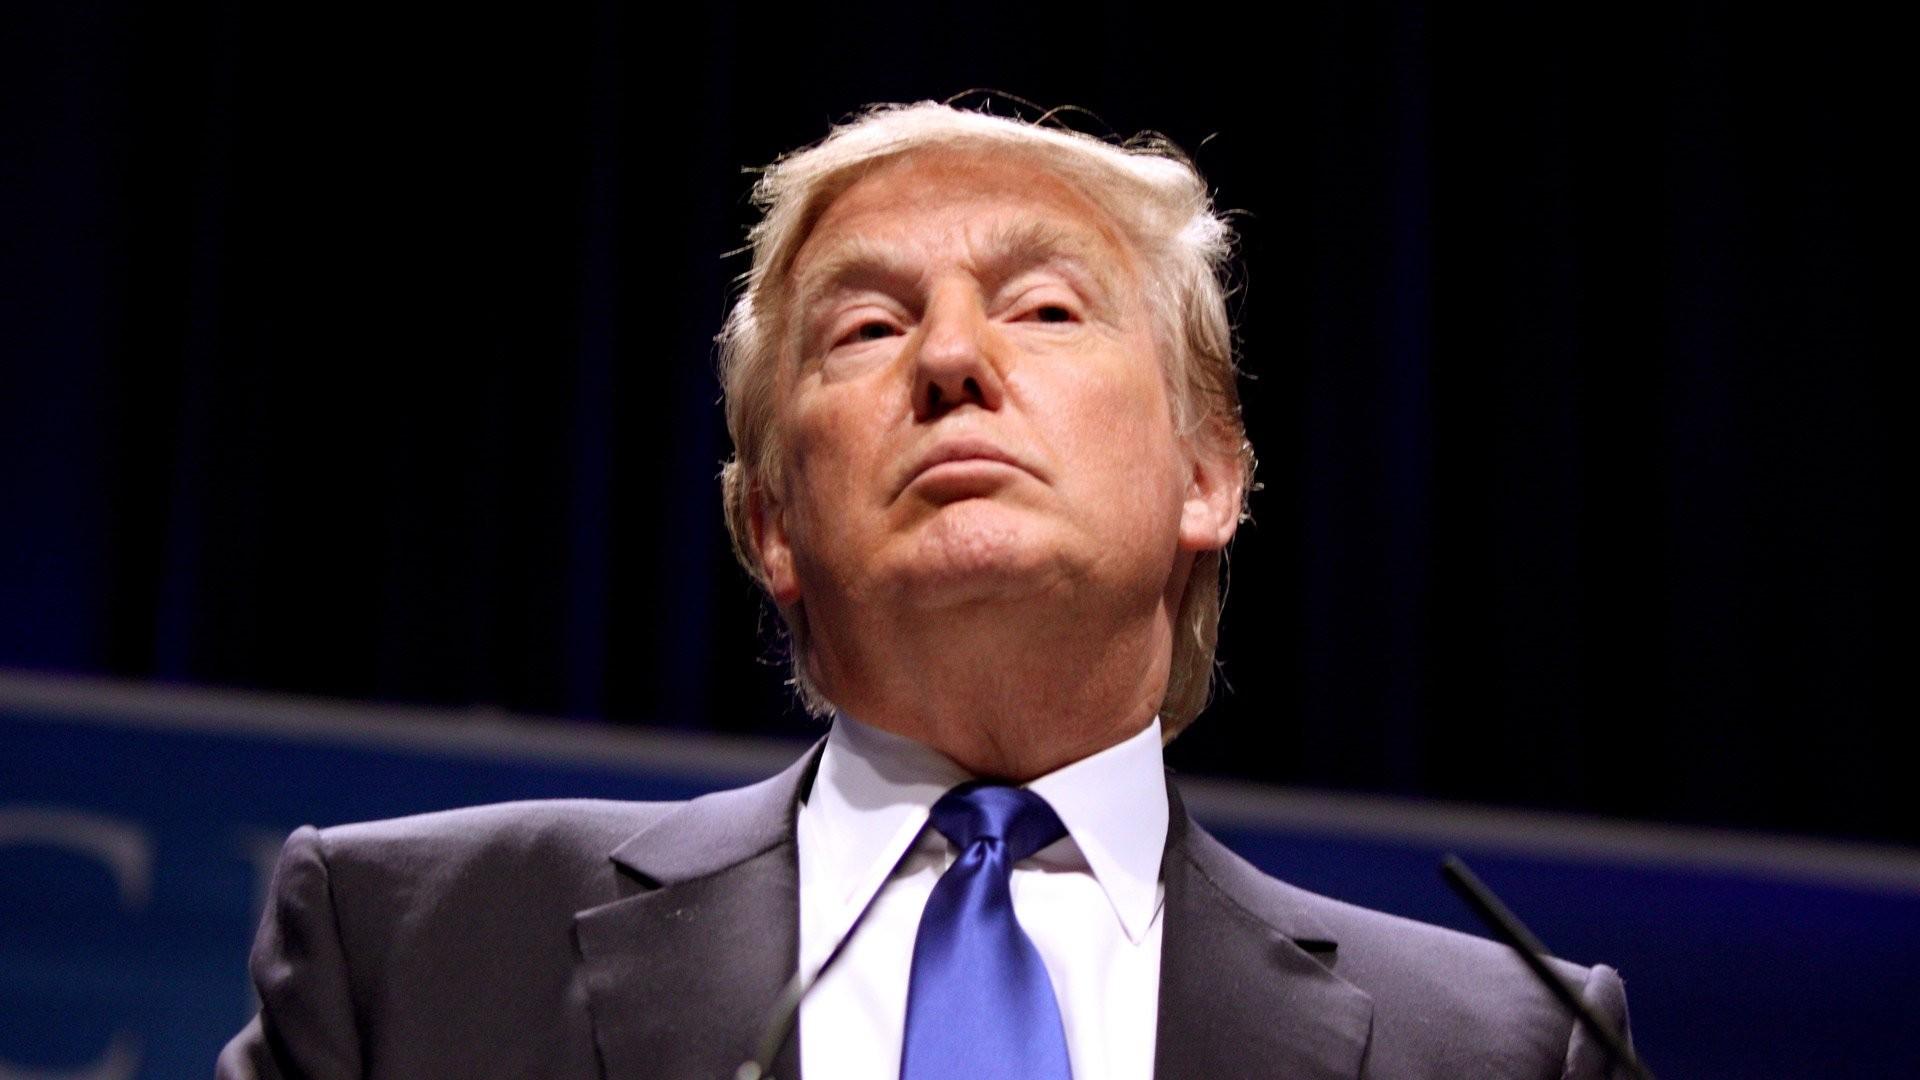 Трамп задел преимущество женщин напрезентации самолета